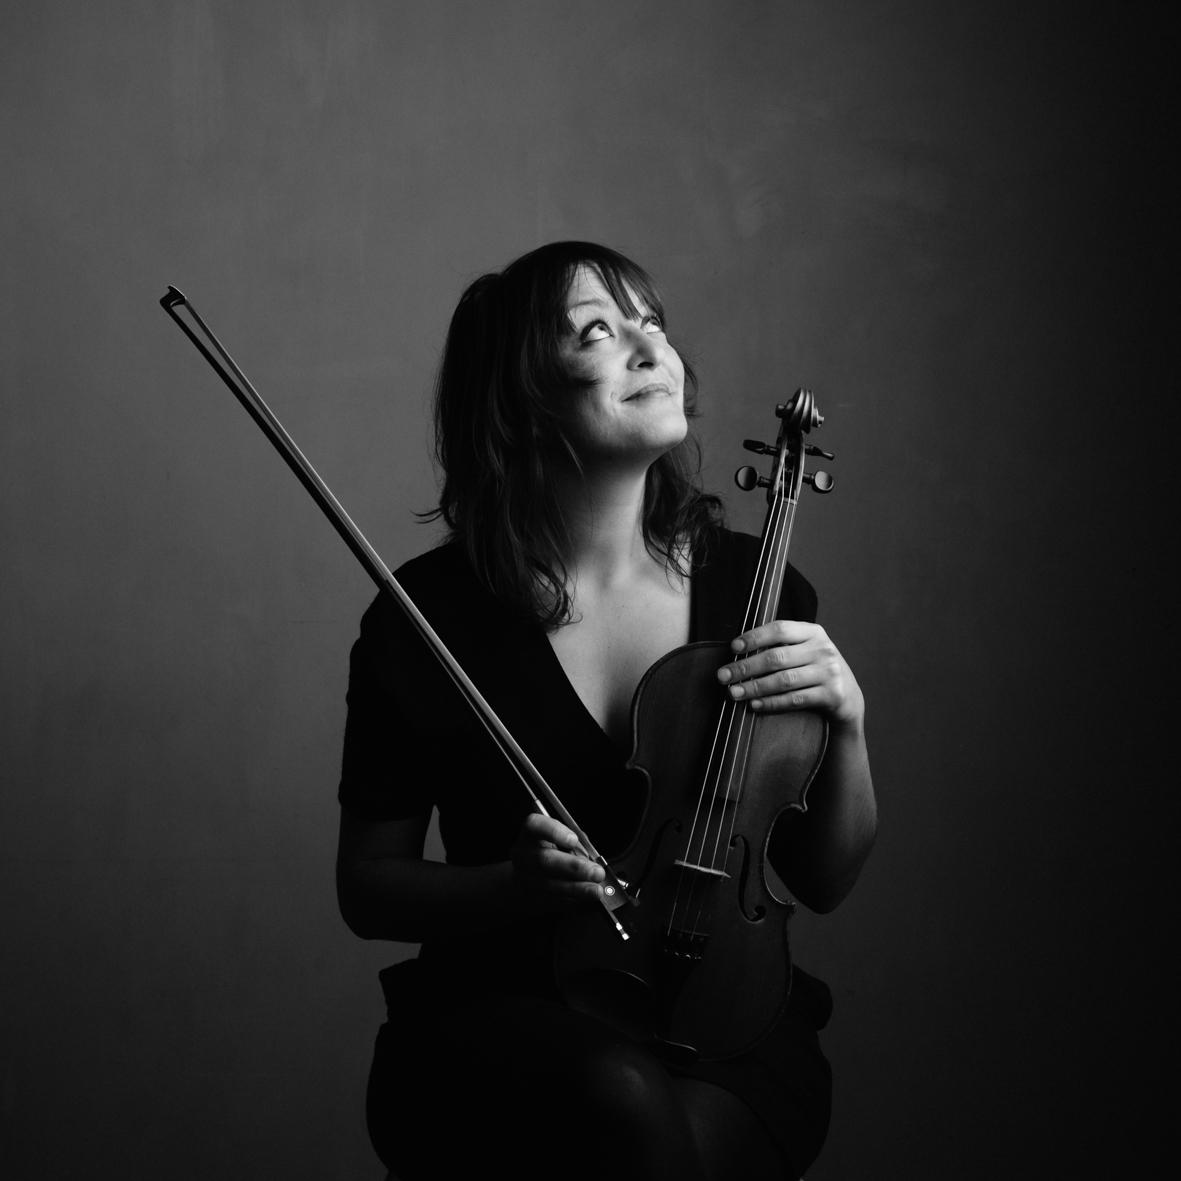 Camille Sabathier